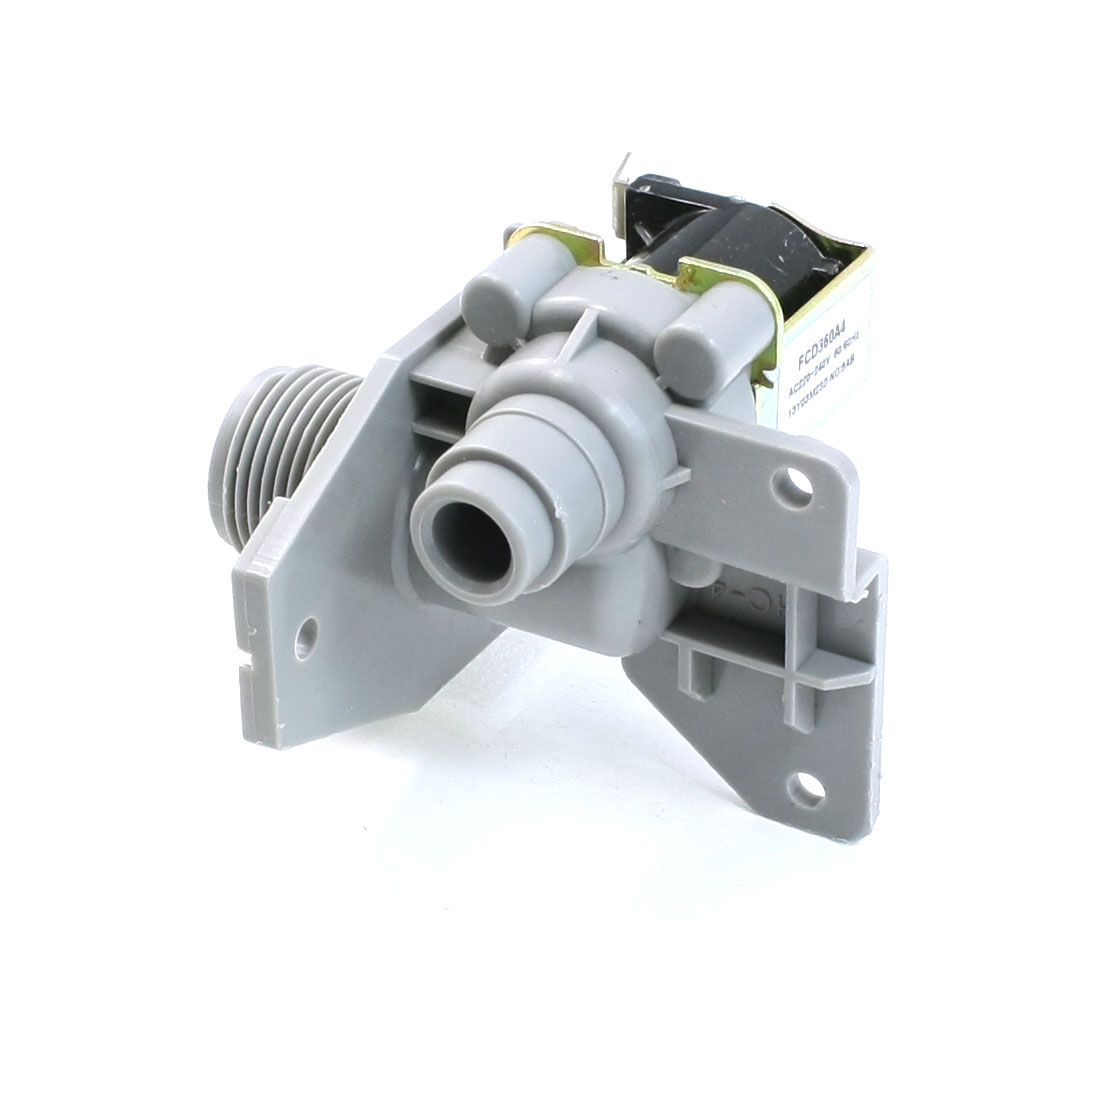 "3/4""PT Water Enter Inlet Solenoid Valve for Washing Machine AC 220/240V"